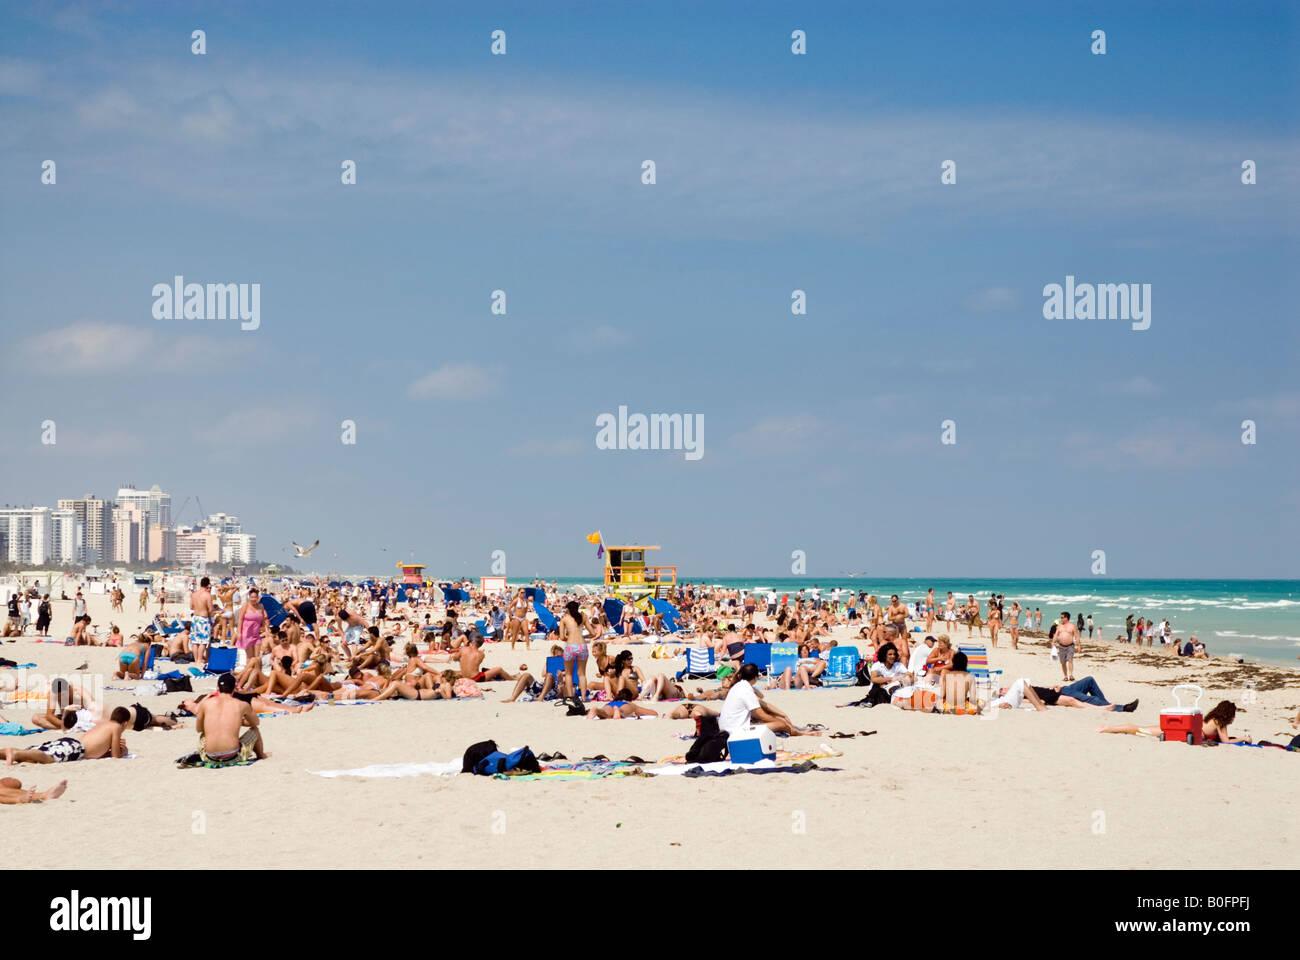 South Beach di Miami, Florida, Stati Uniti d'America Immagini Stock